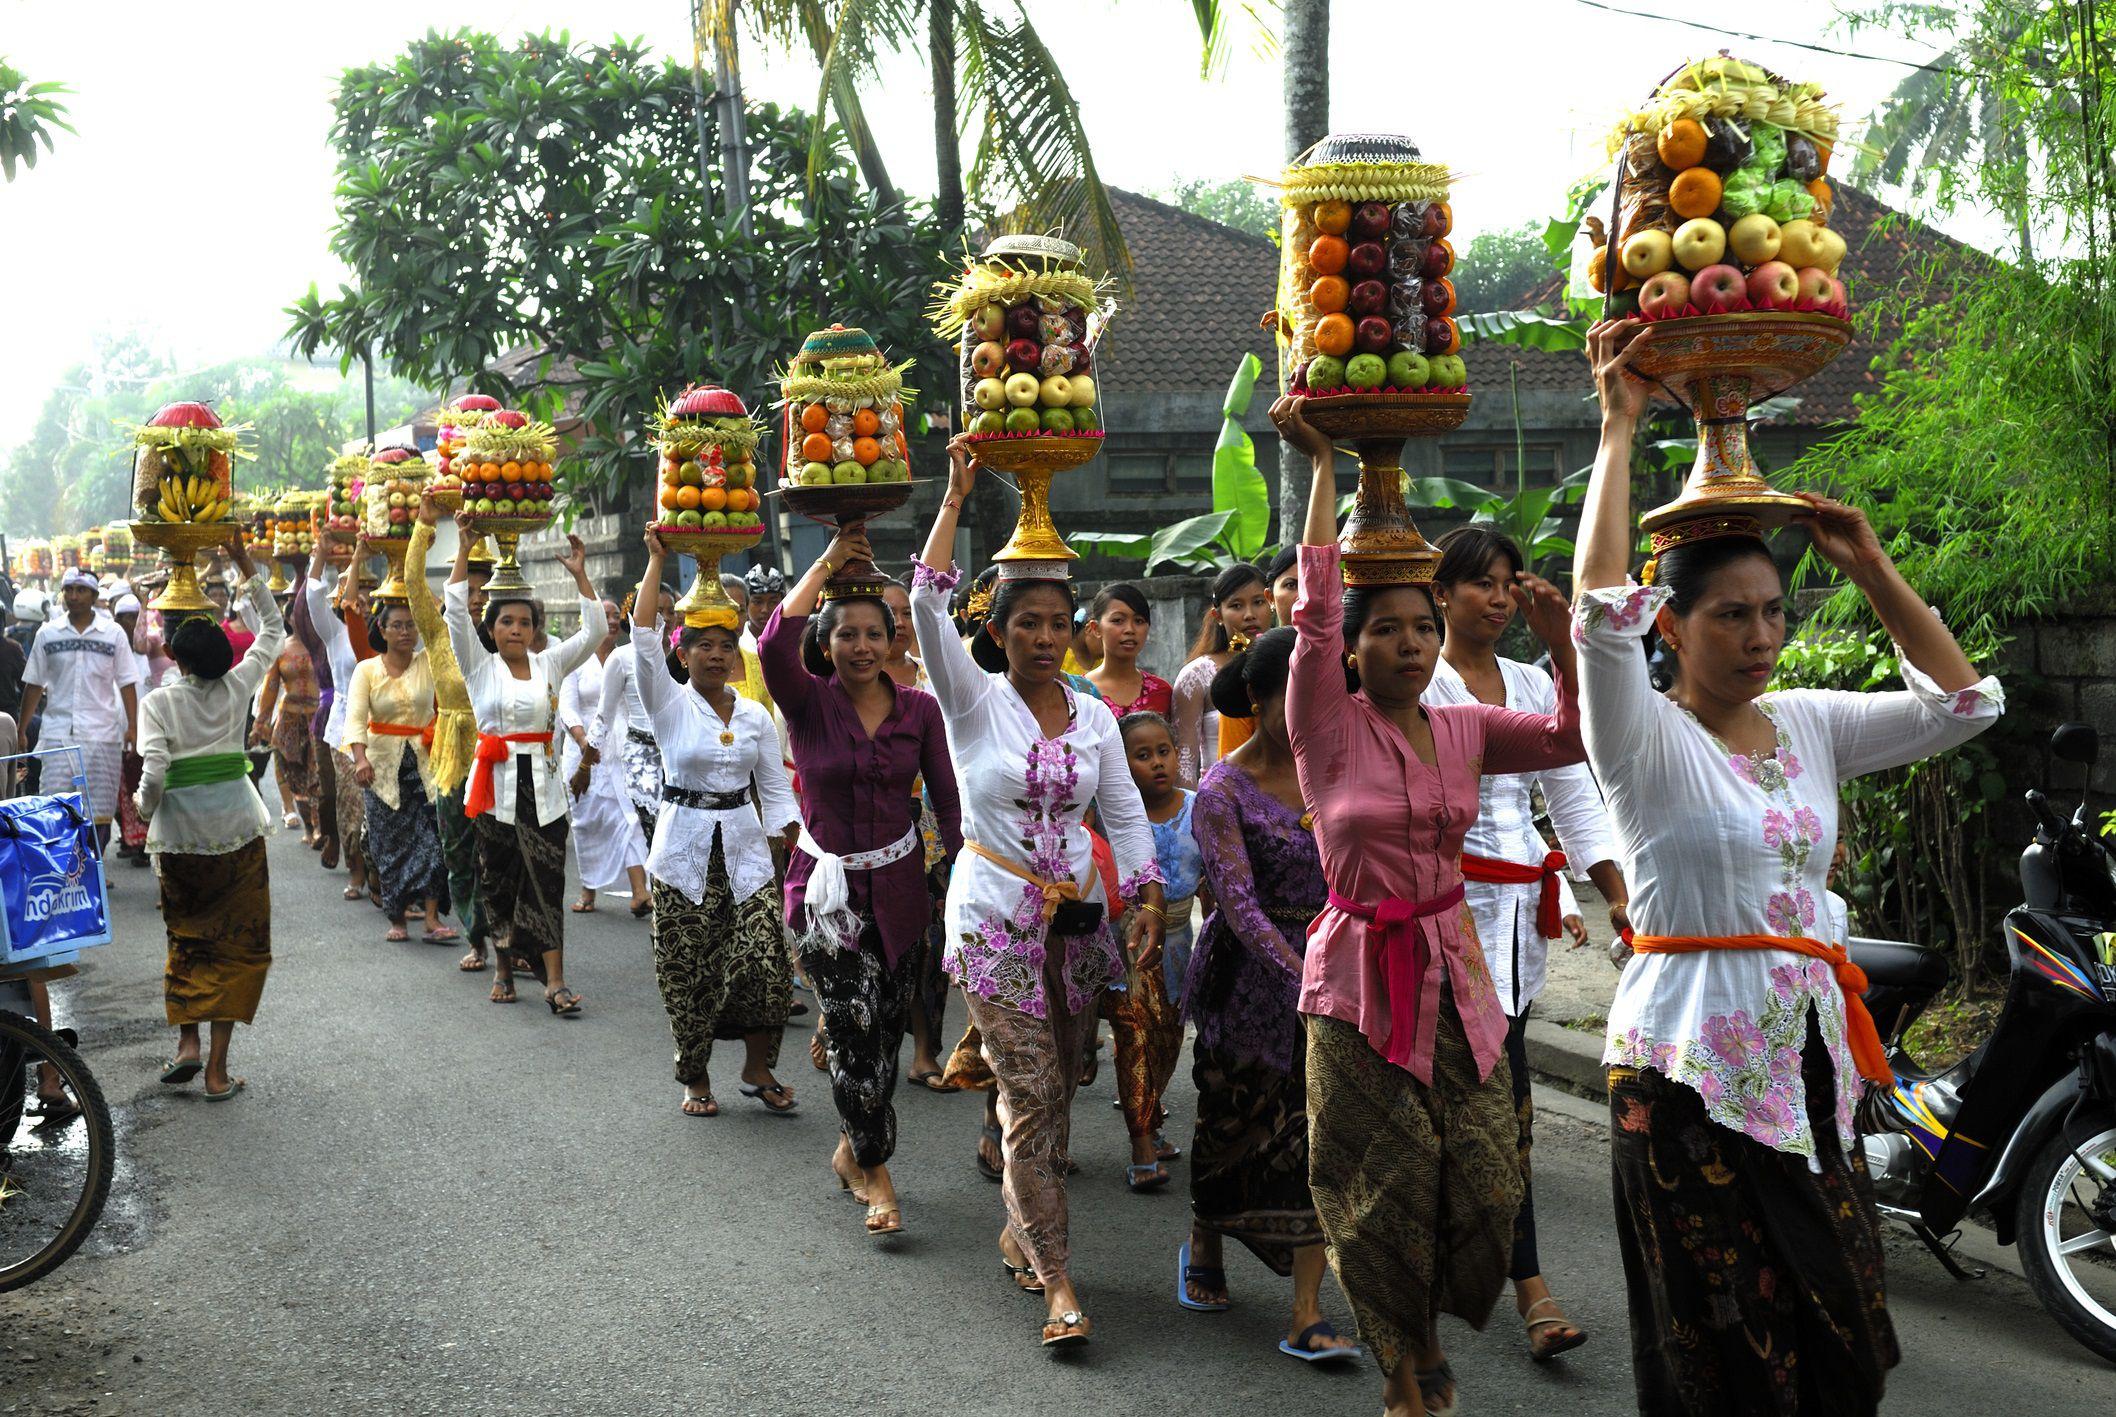 Festival de Galungan, Bali, Indonesia